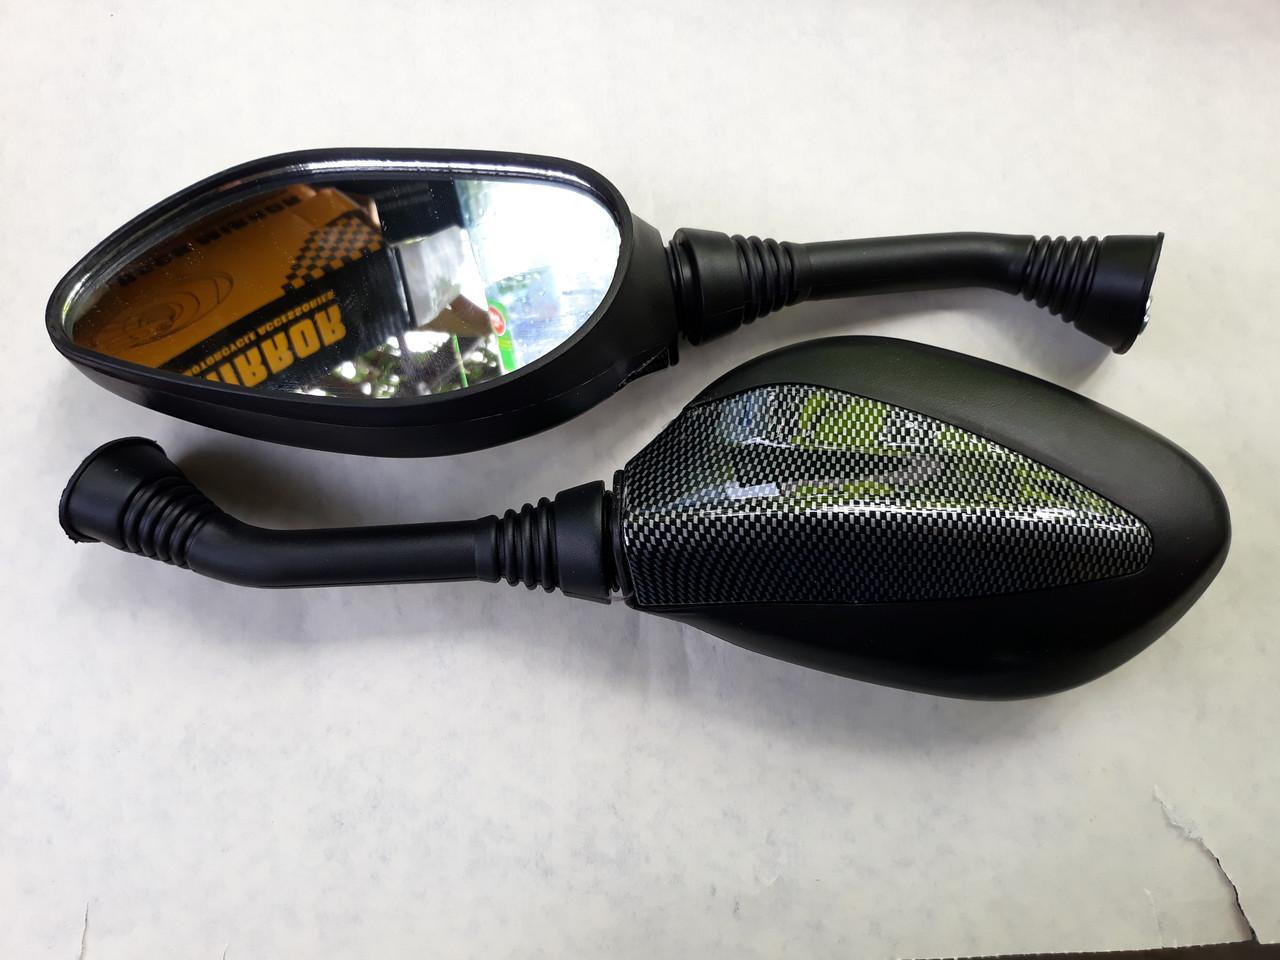 Дзеркала карбон для GY6 50cc